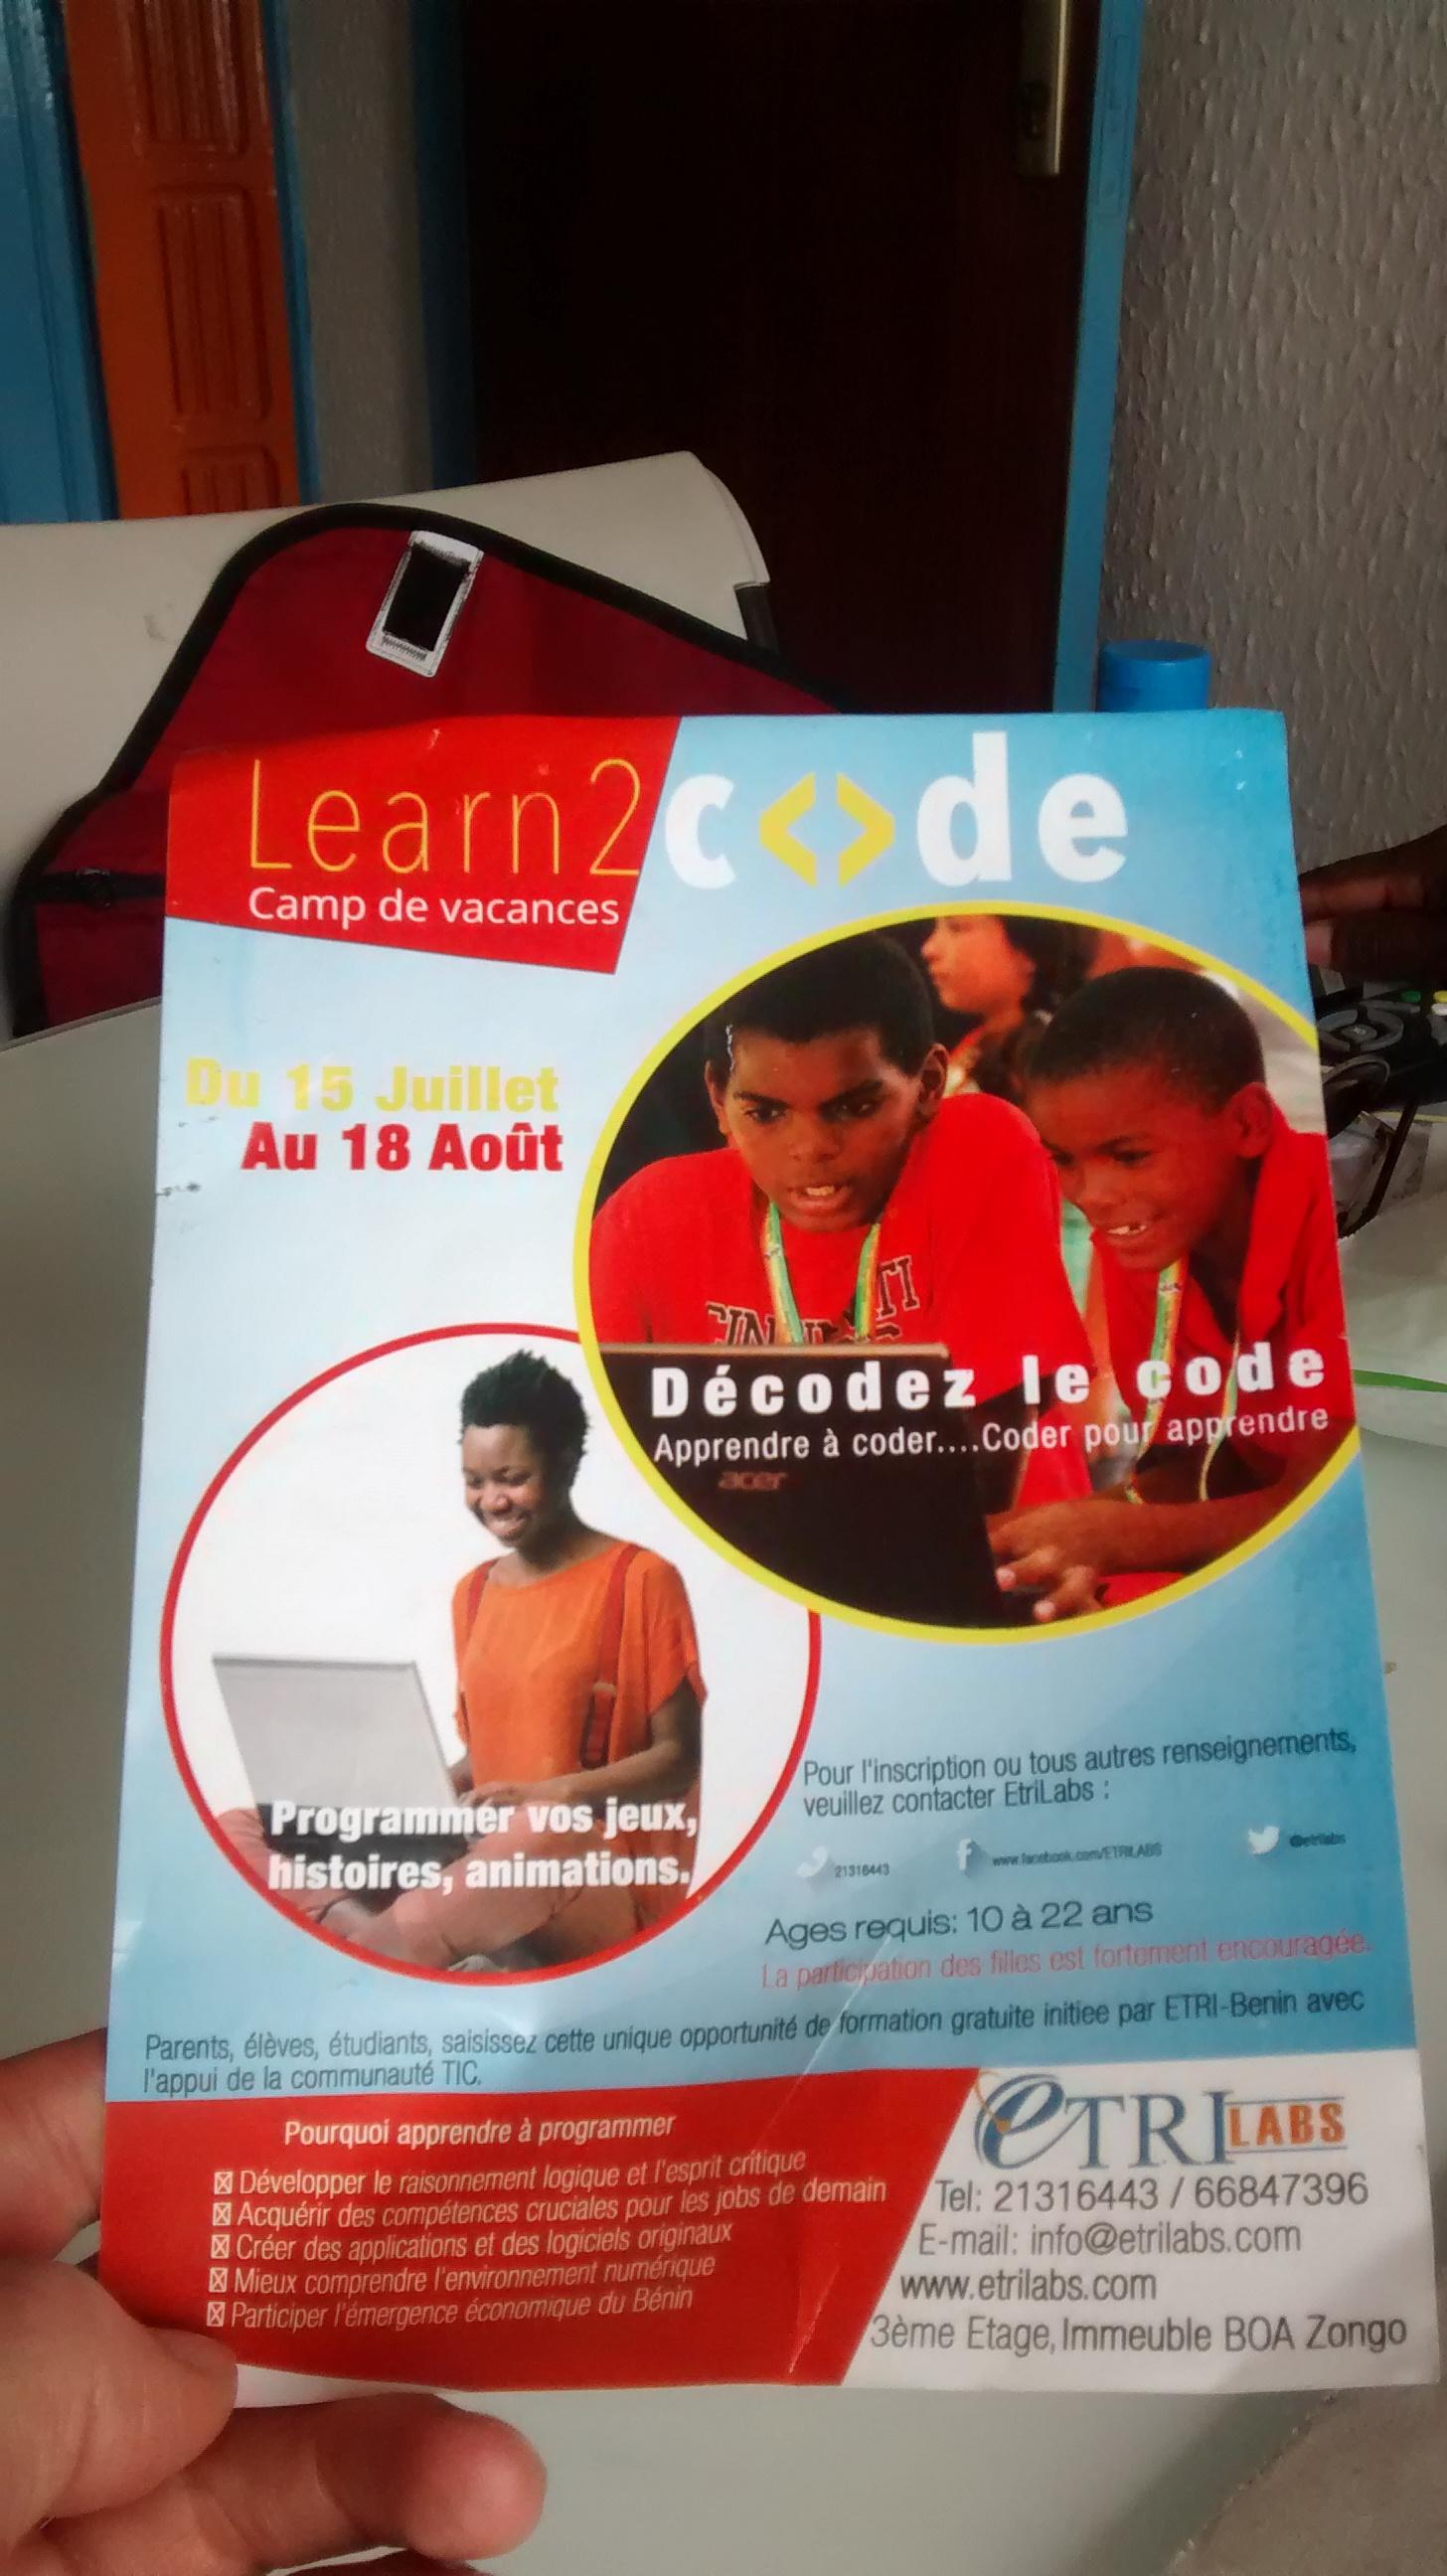 Kids-coding-Africa-benin-startup-africa-innovation